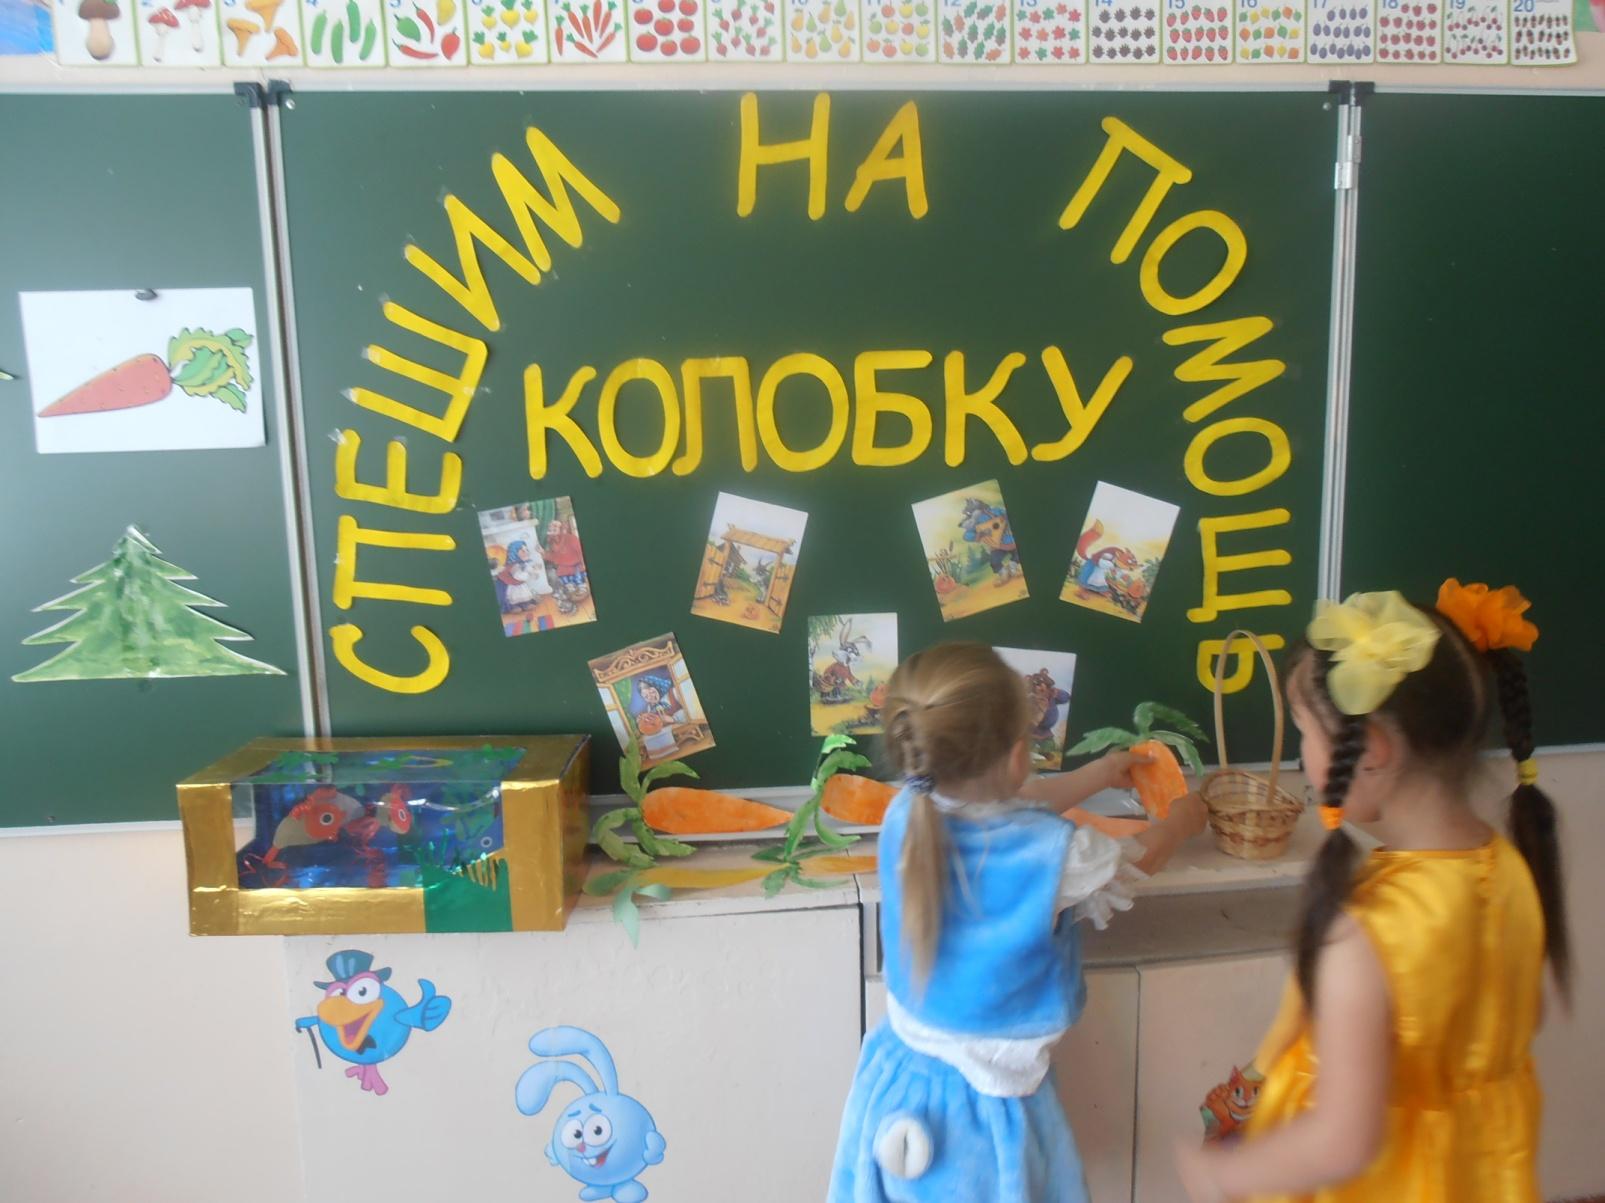 C:\Users\Анна Владимировна\Desktop\детский сад 2015\колобок\P5150030.JPG